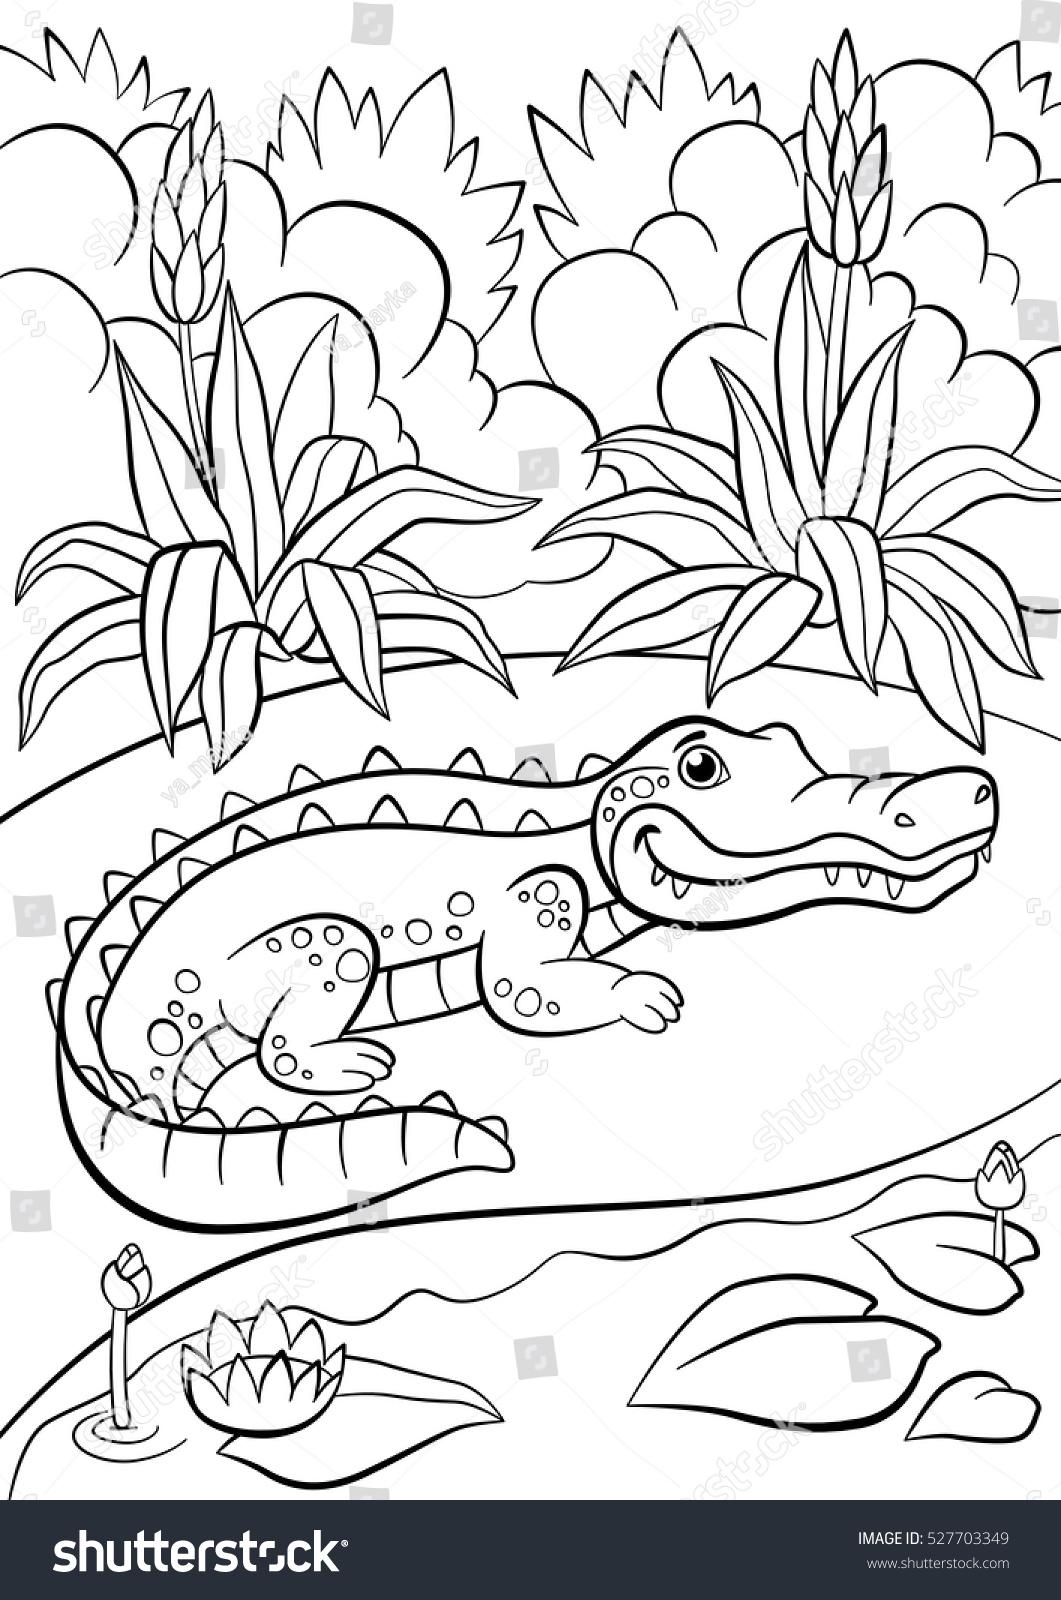 Enchanting Allie Alligator Coloring Page Model - Framing Coloring ...